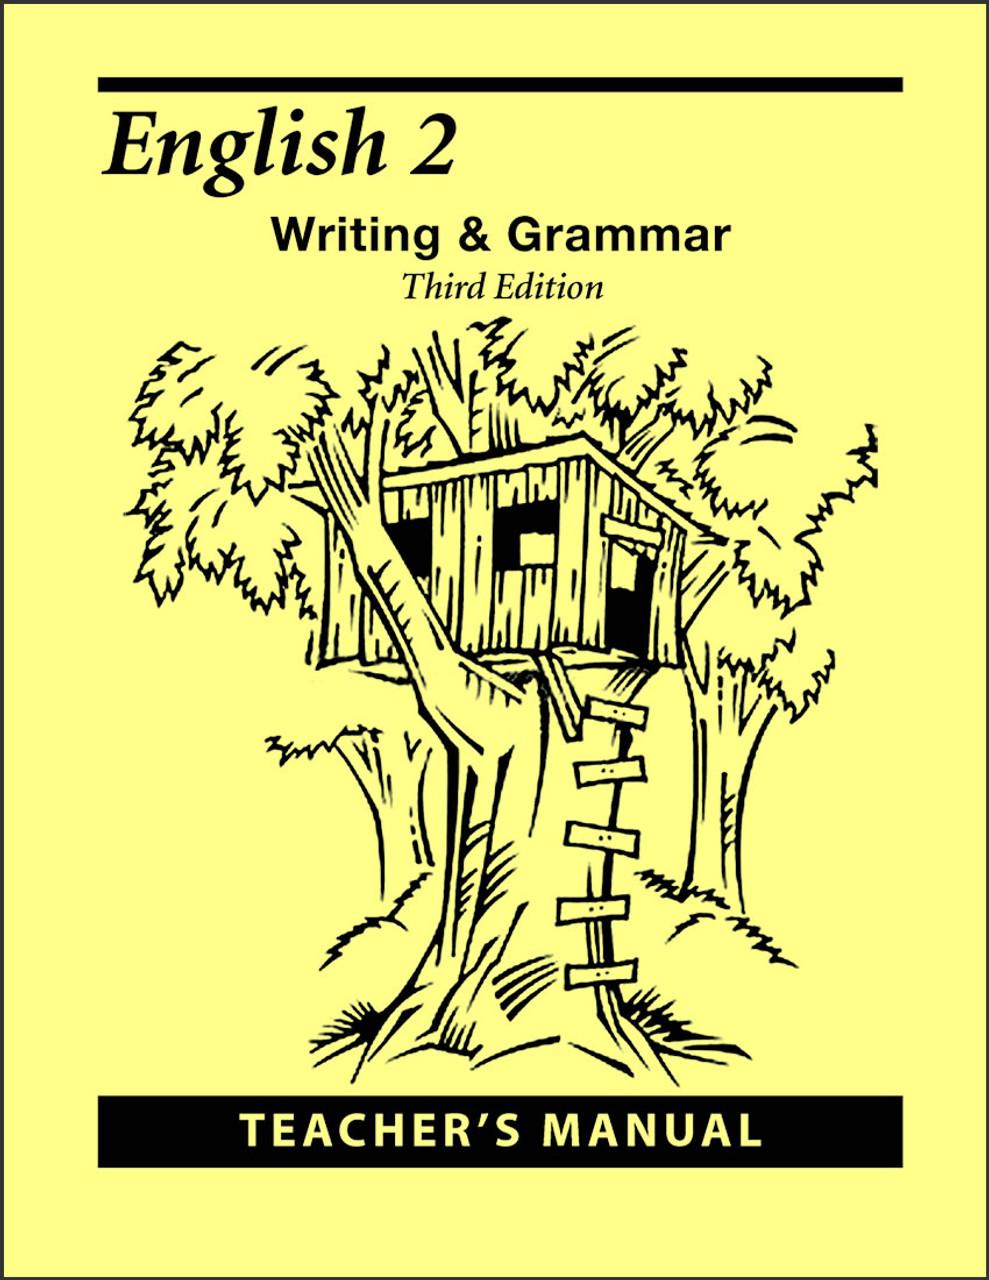 English 2: Writing and Grammar, 3rd edition - Teacher's Manual